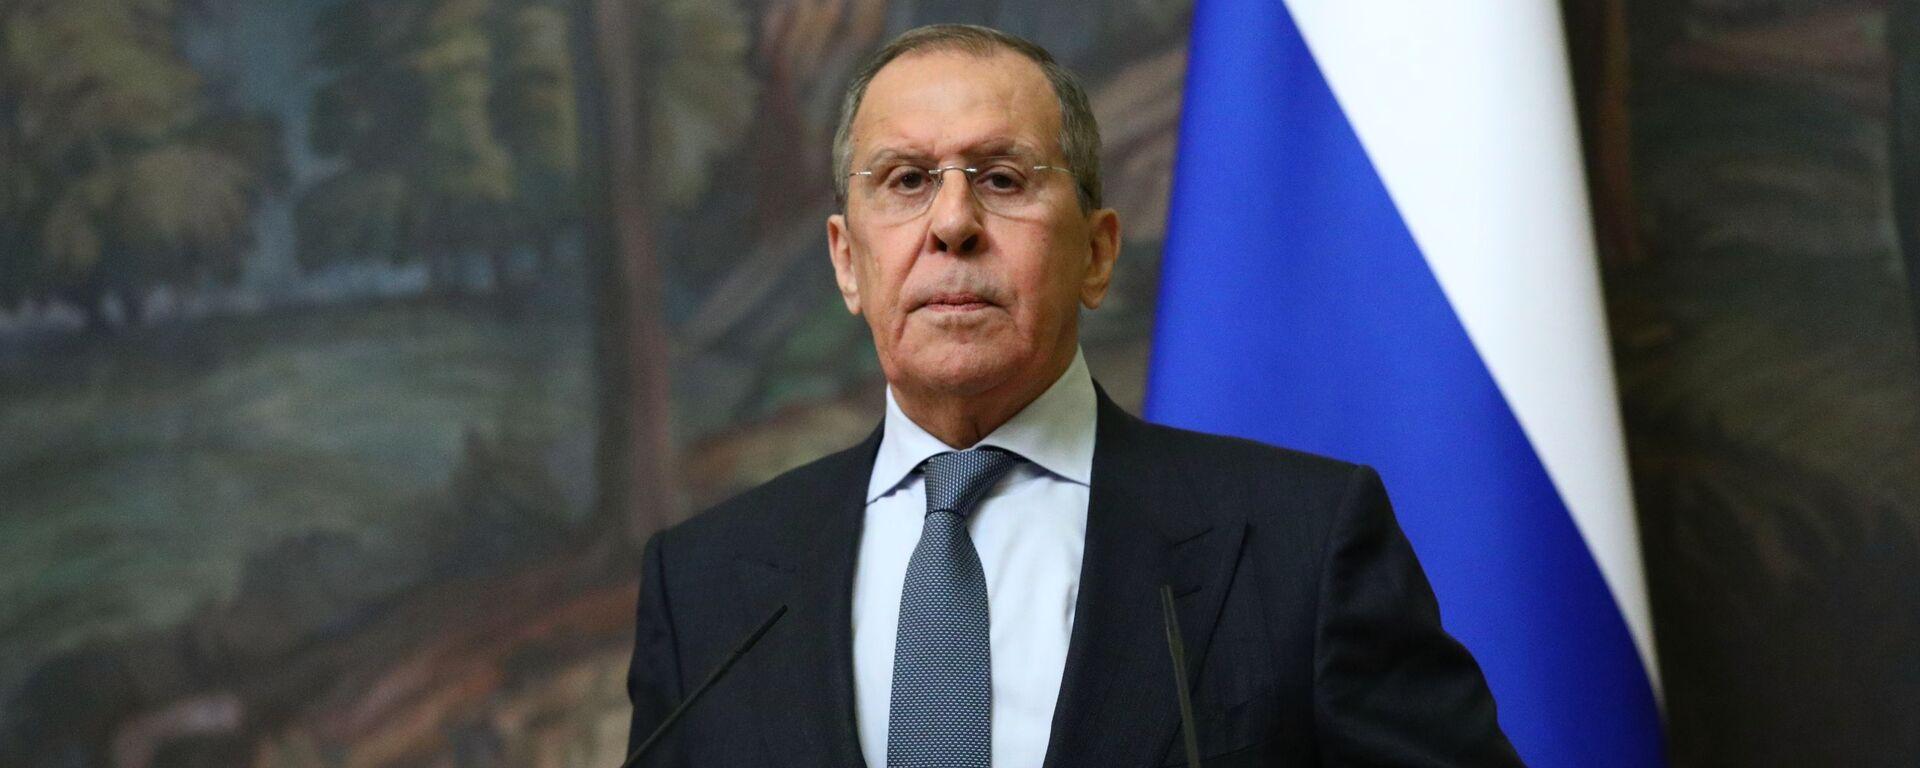 El ministro de Relaciones Exteriores de Rusia Sergéi Lavrov - Sputnik Mundo, 1920, 02.02.2021